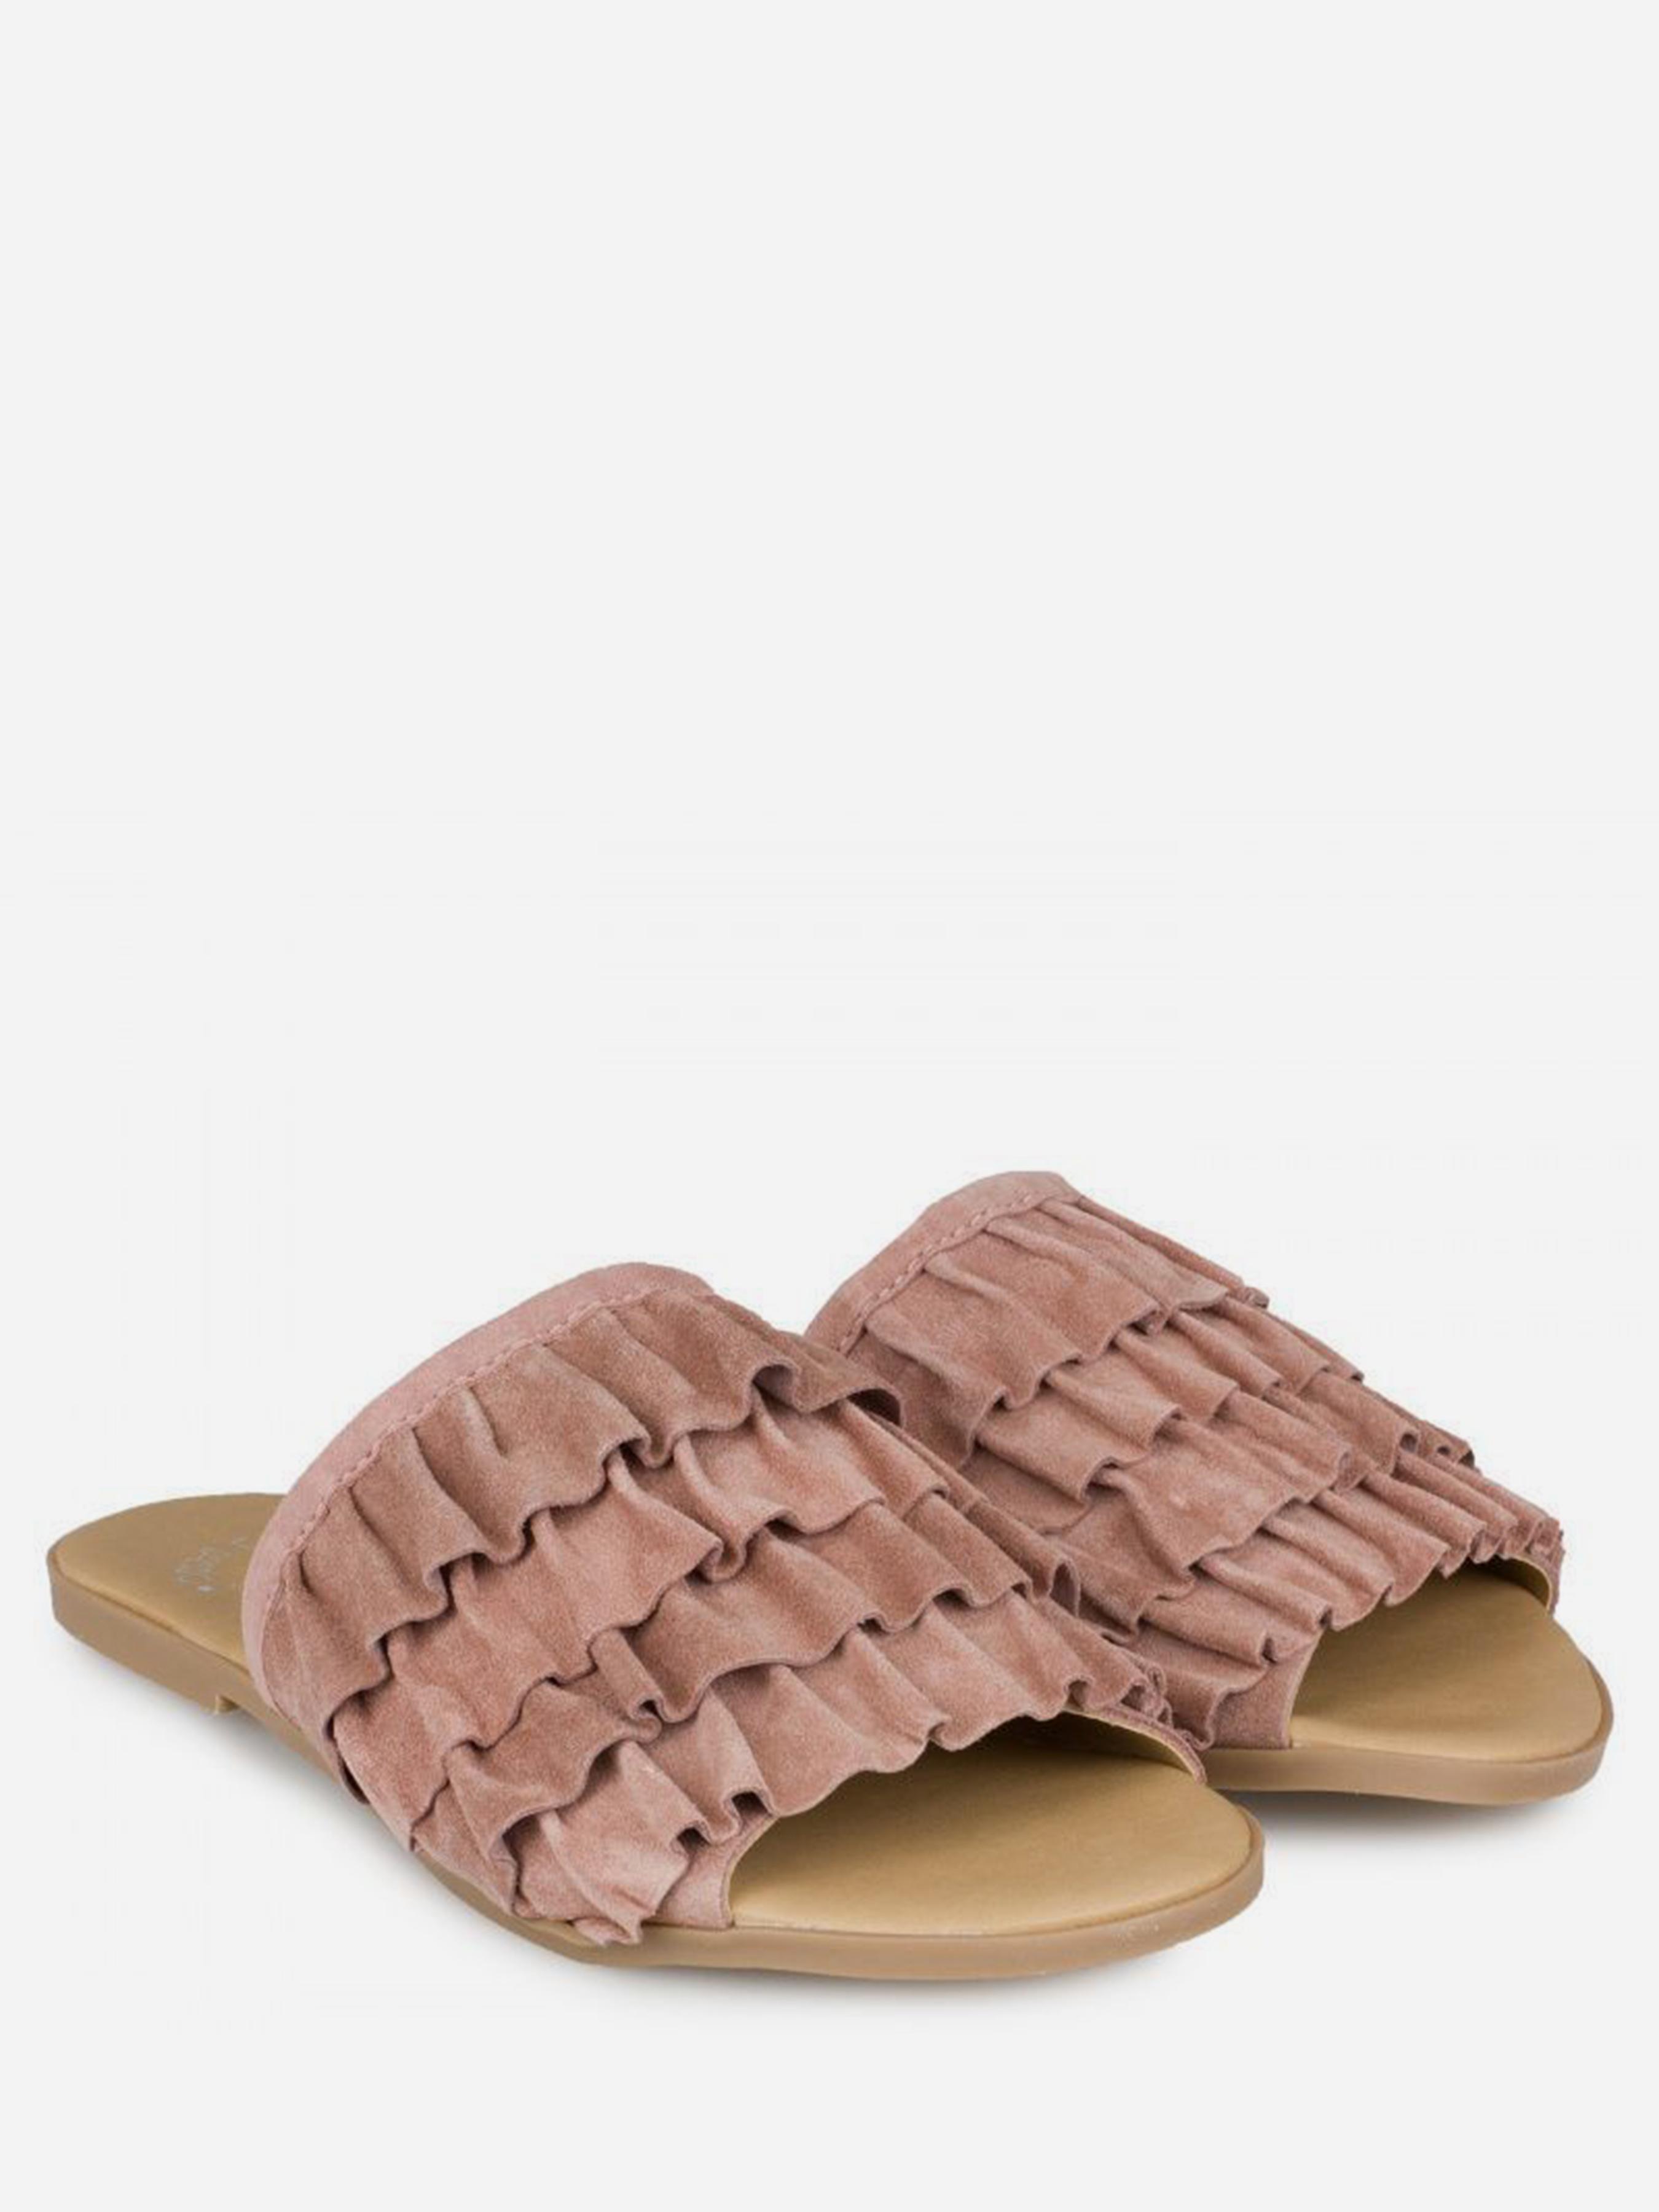 Шлёпанцы для женщин Casta & Dolly 1Z5 модная обувь, 2017